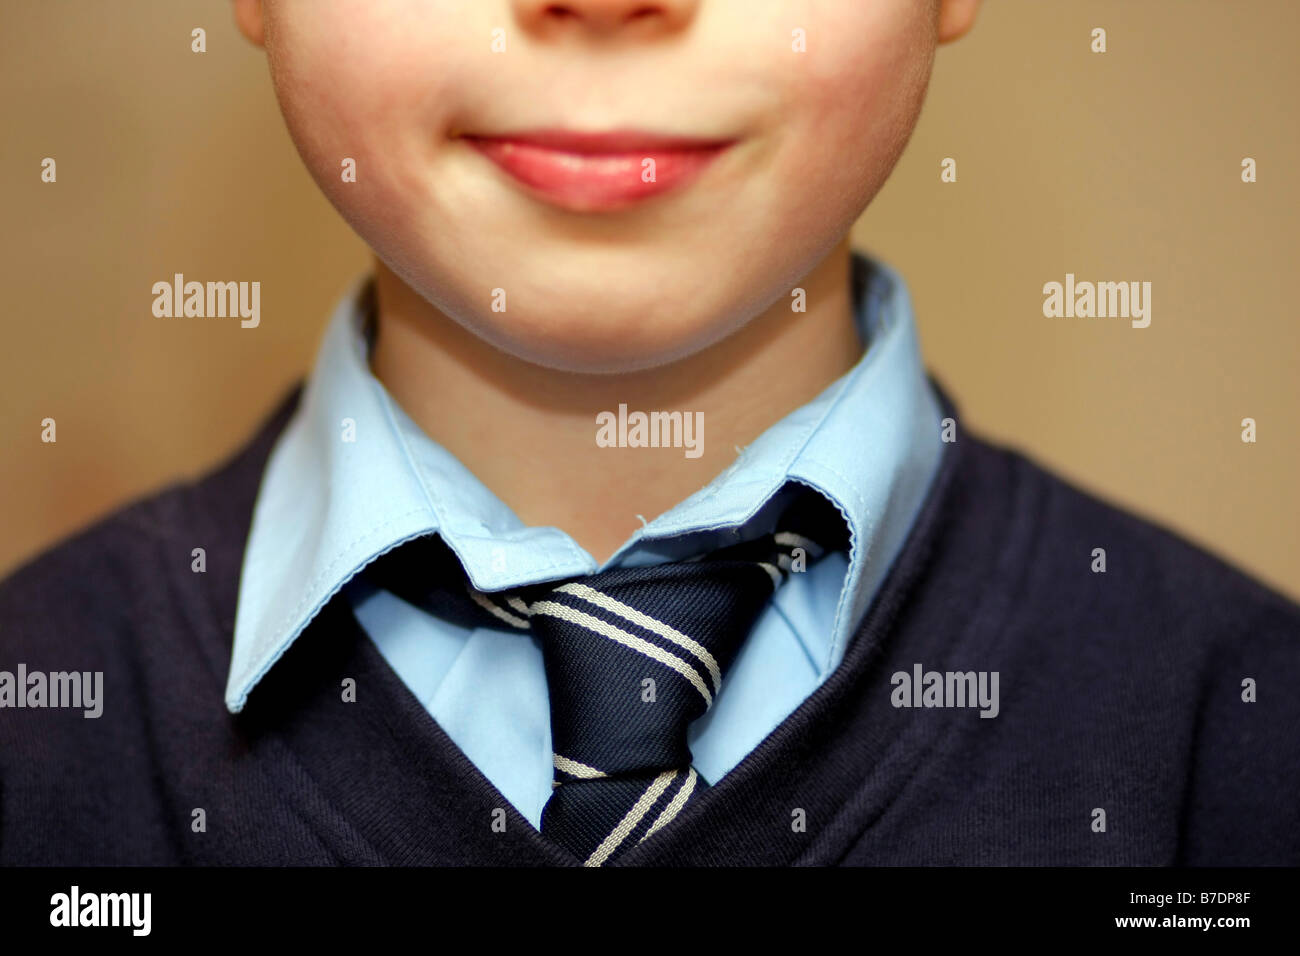 schoolboy wearing school tie - Stock Image